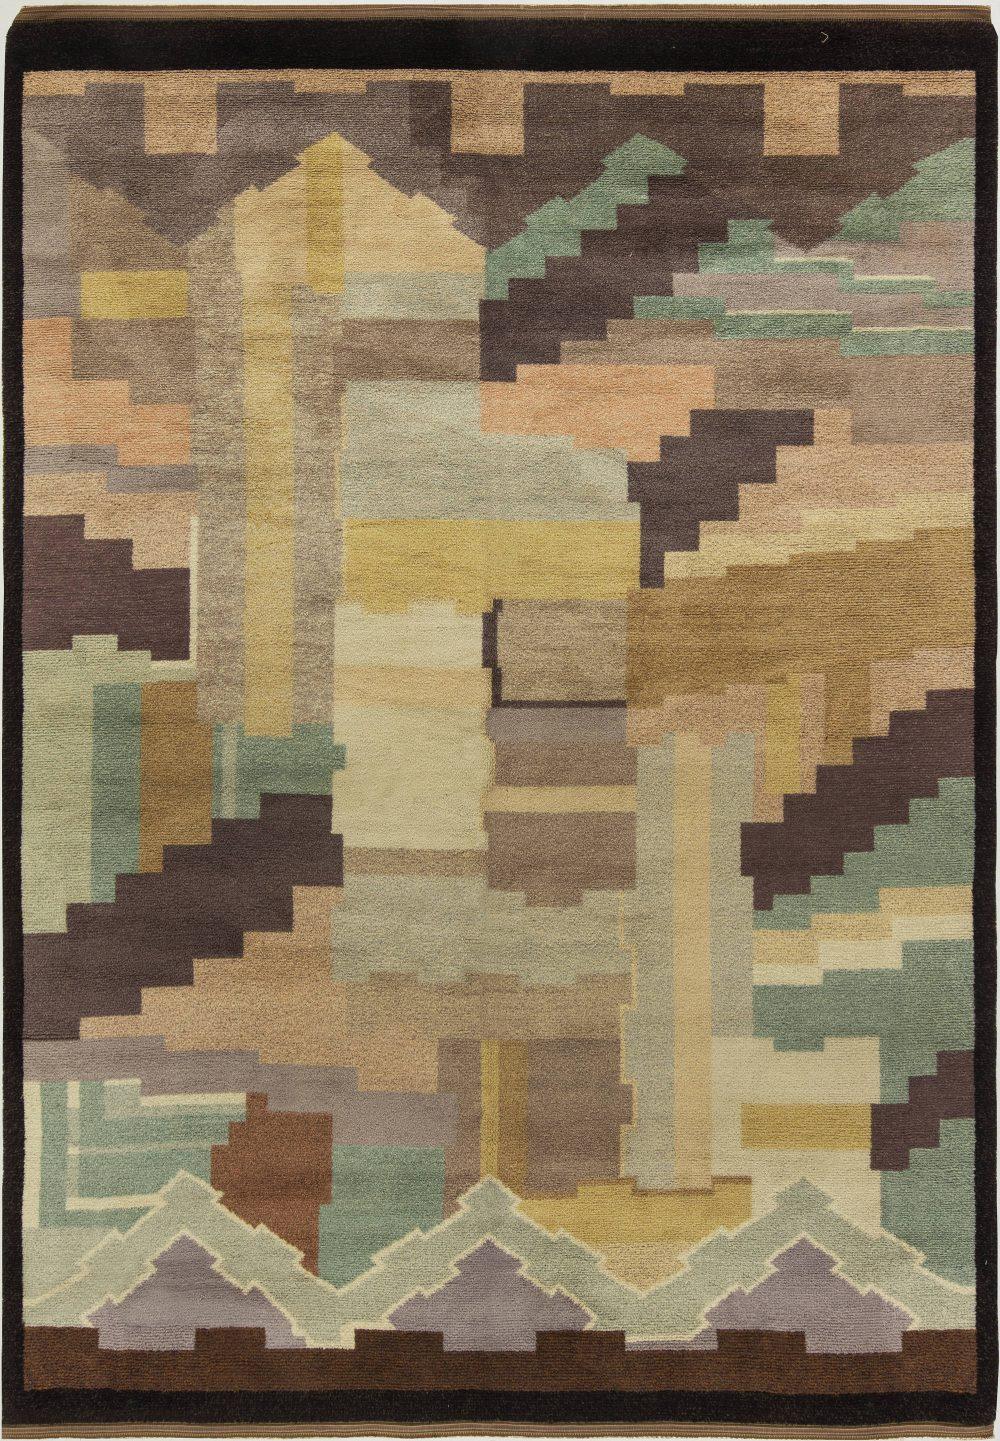 Finish Art Deco Rug by Greta Skoaster Woven at Kiikan Kutamo Workshop BB6858